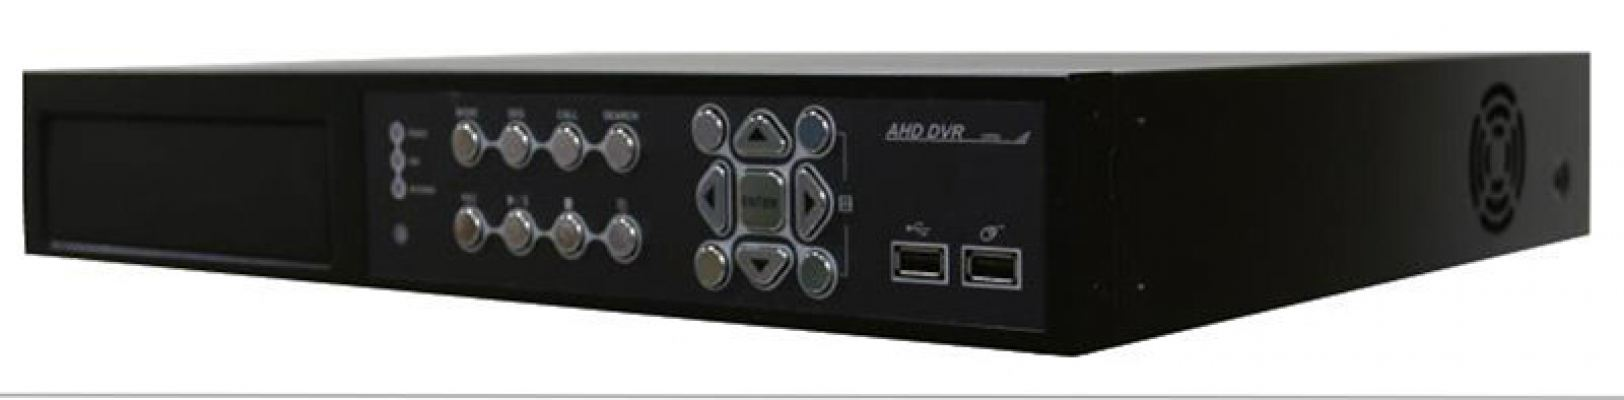 AHD 1080p Hybrid DVR